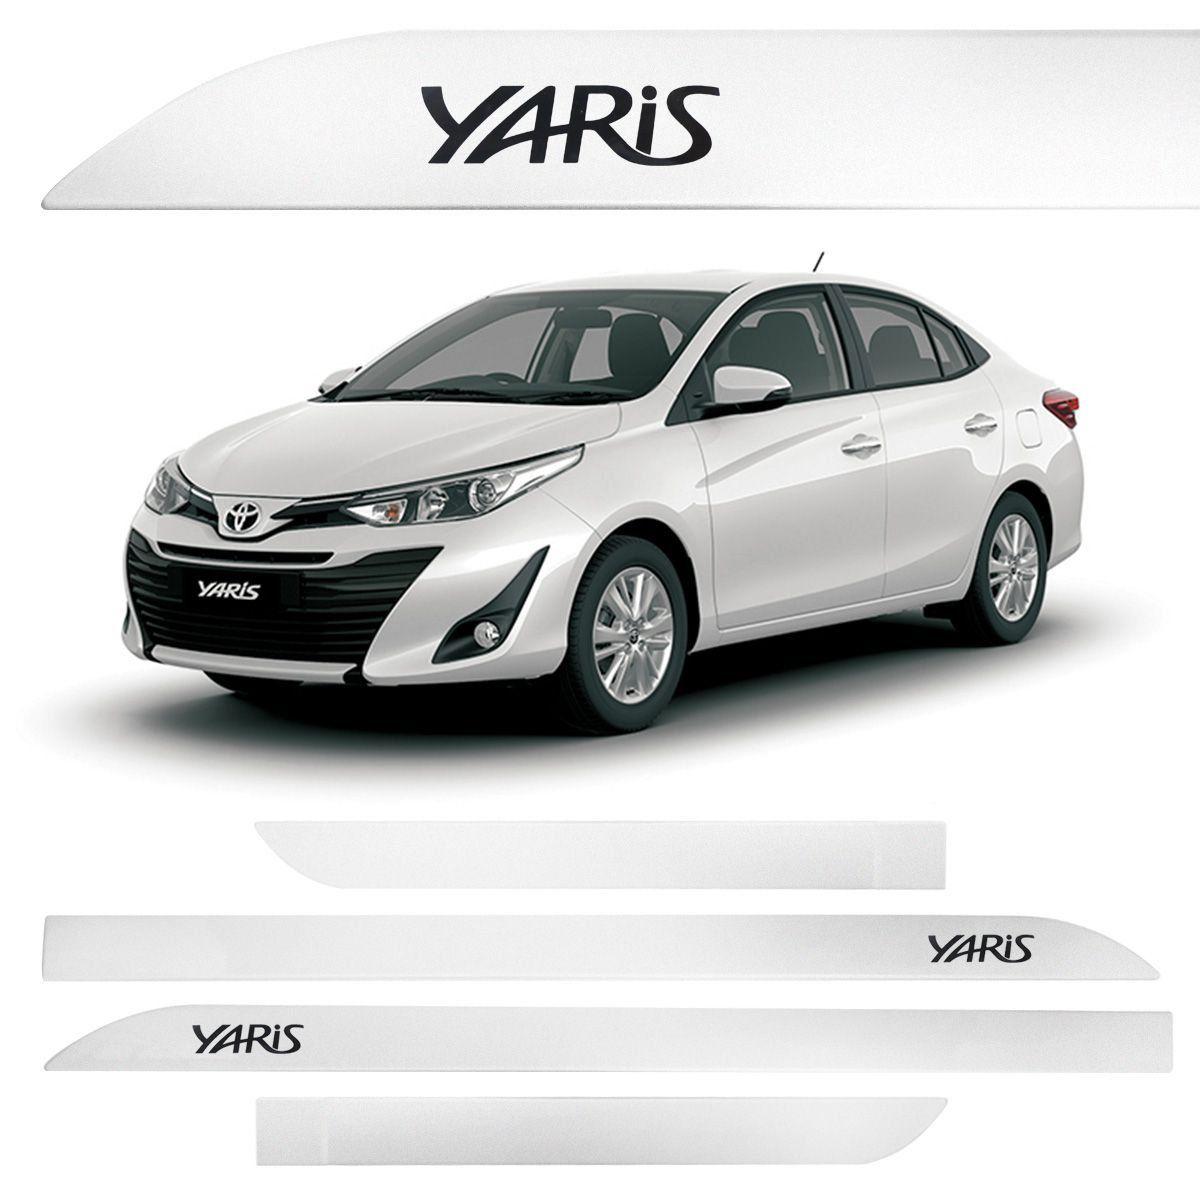 Jogo Friso Lateral Toyota Yaris Branco Perola